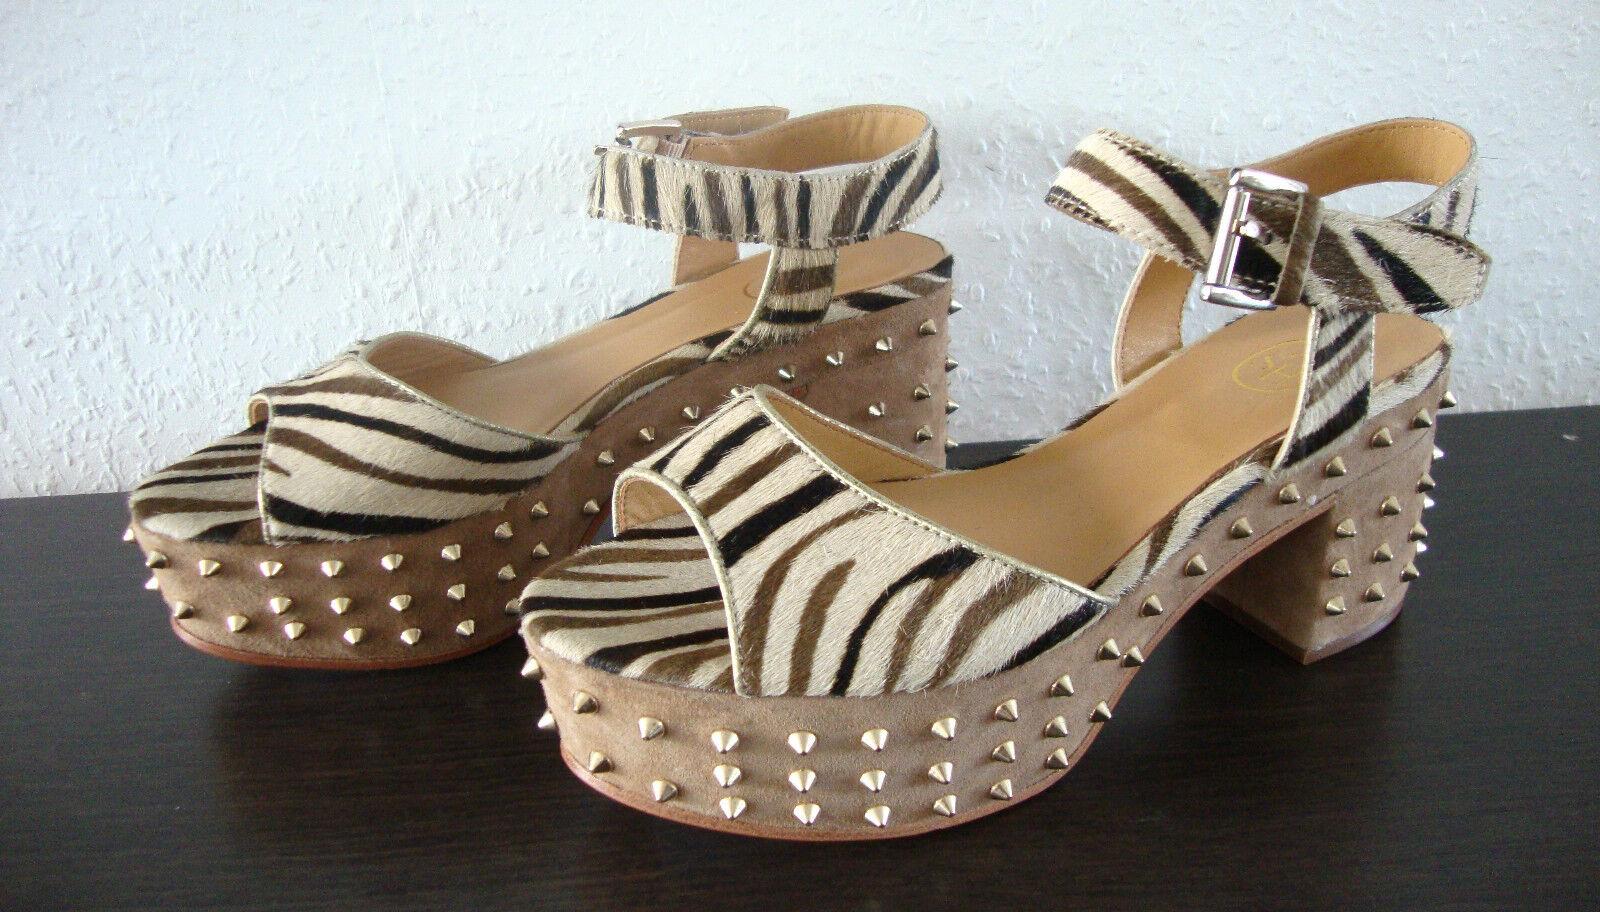 ASH CAPRICE Sandalo Sandalo Sandalo  Scarpe in pelle sandali da donna   Sandalo ab926d